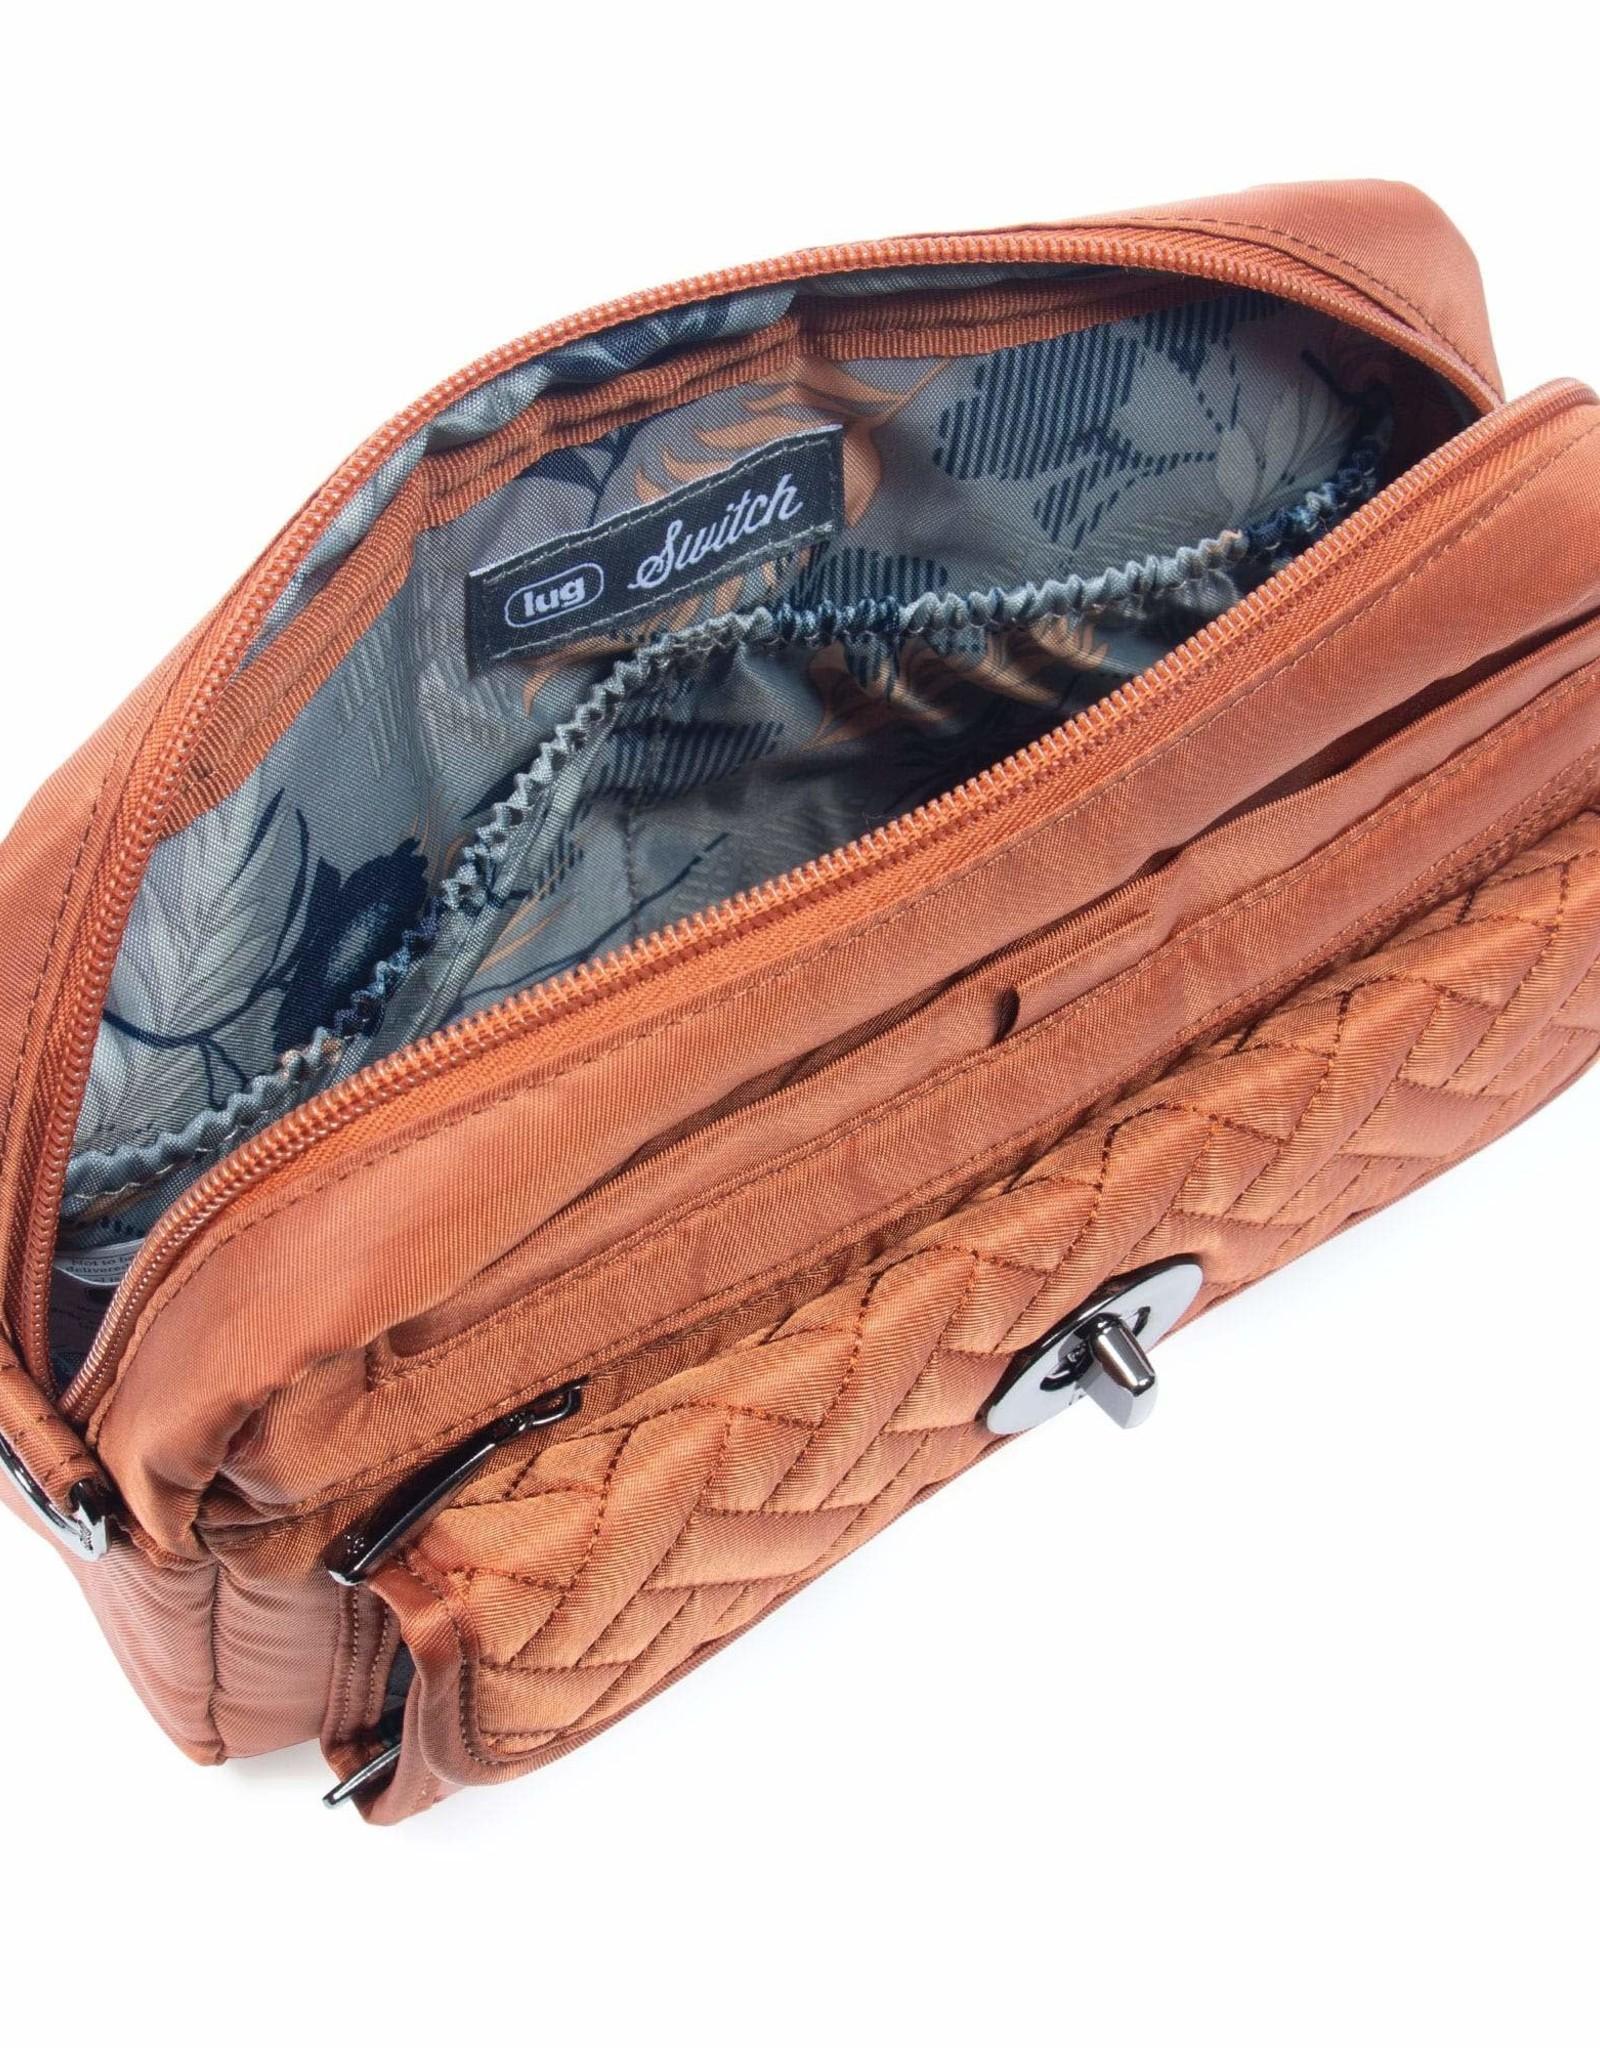 Lug Lug Switch Cross Body Bag